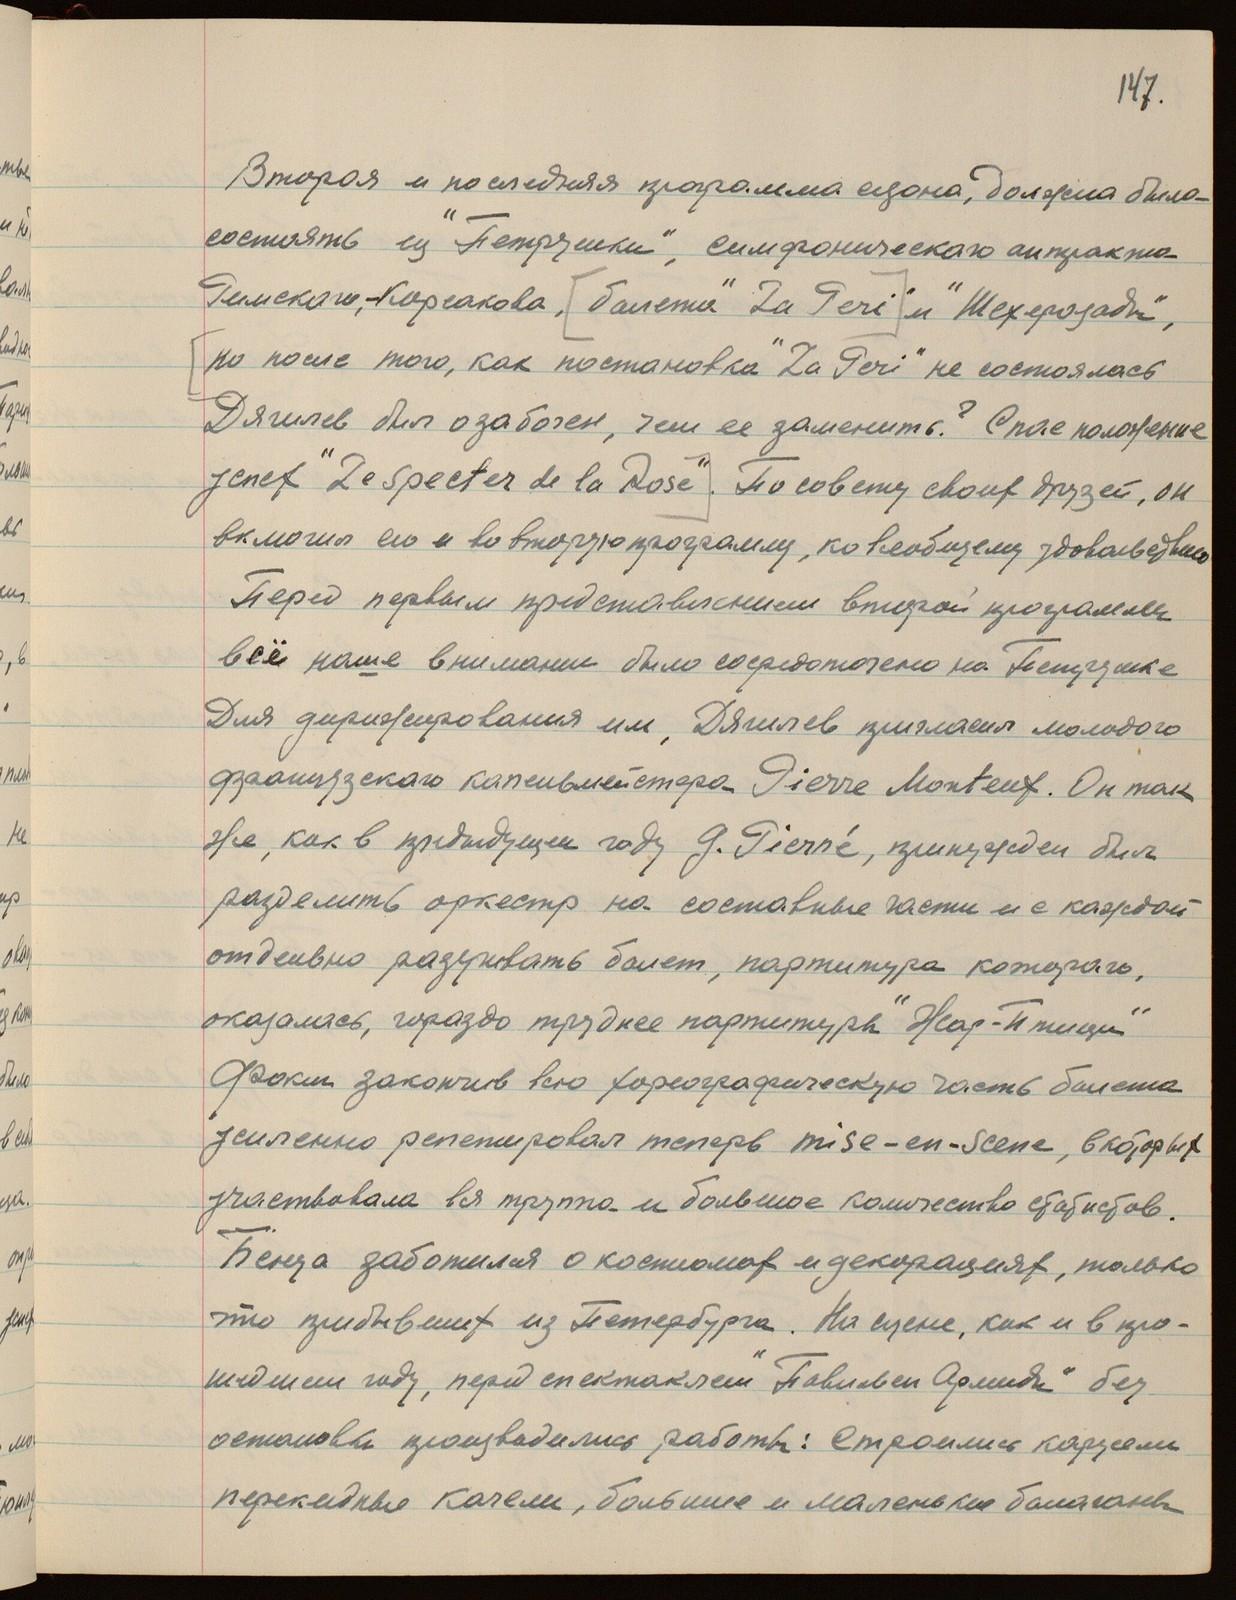 """ Tetrad'ka N.1 / Russkii Balet / S.P. Diagileva / 1909-1929. / 1909-1911 / S.L. Grigor'ev / 6 Maia 1952 / Golders Green London"". (On title page.)"